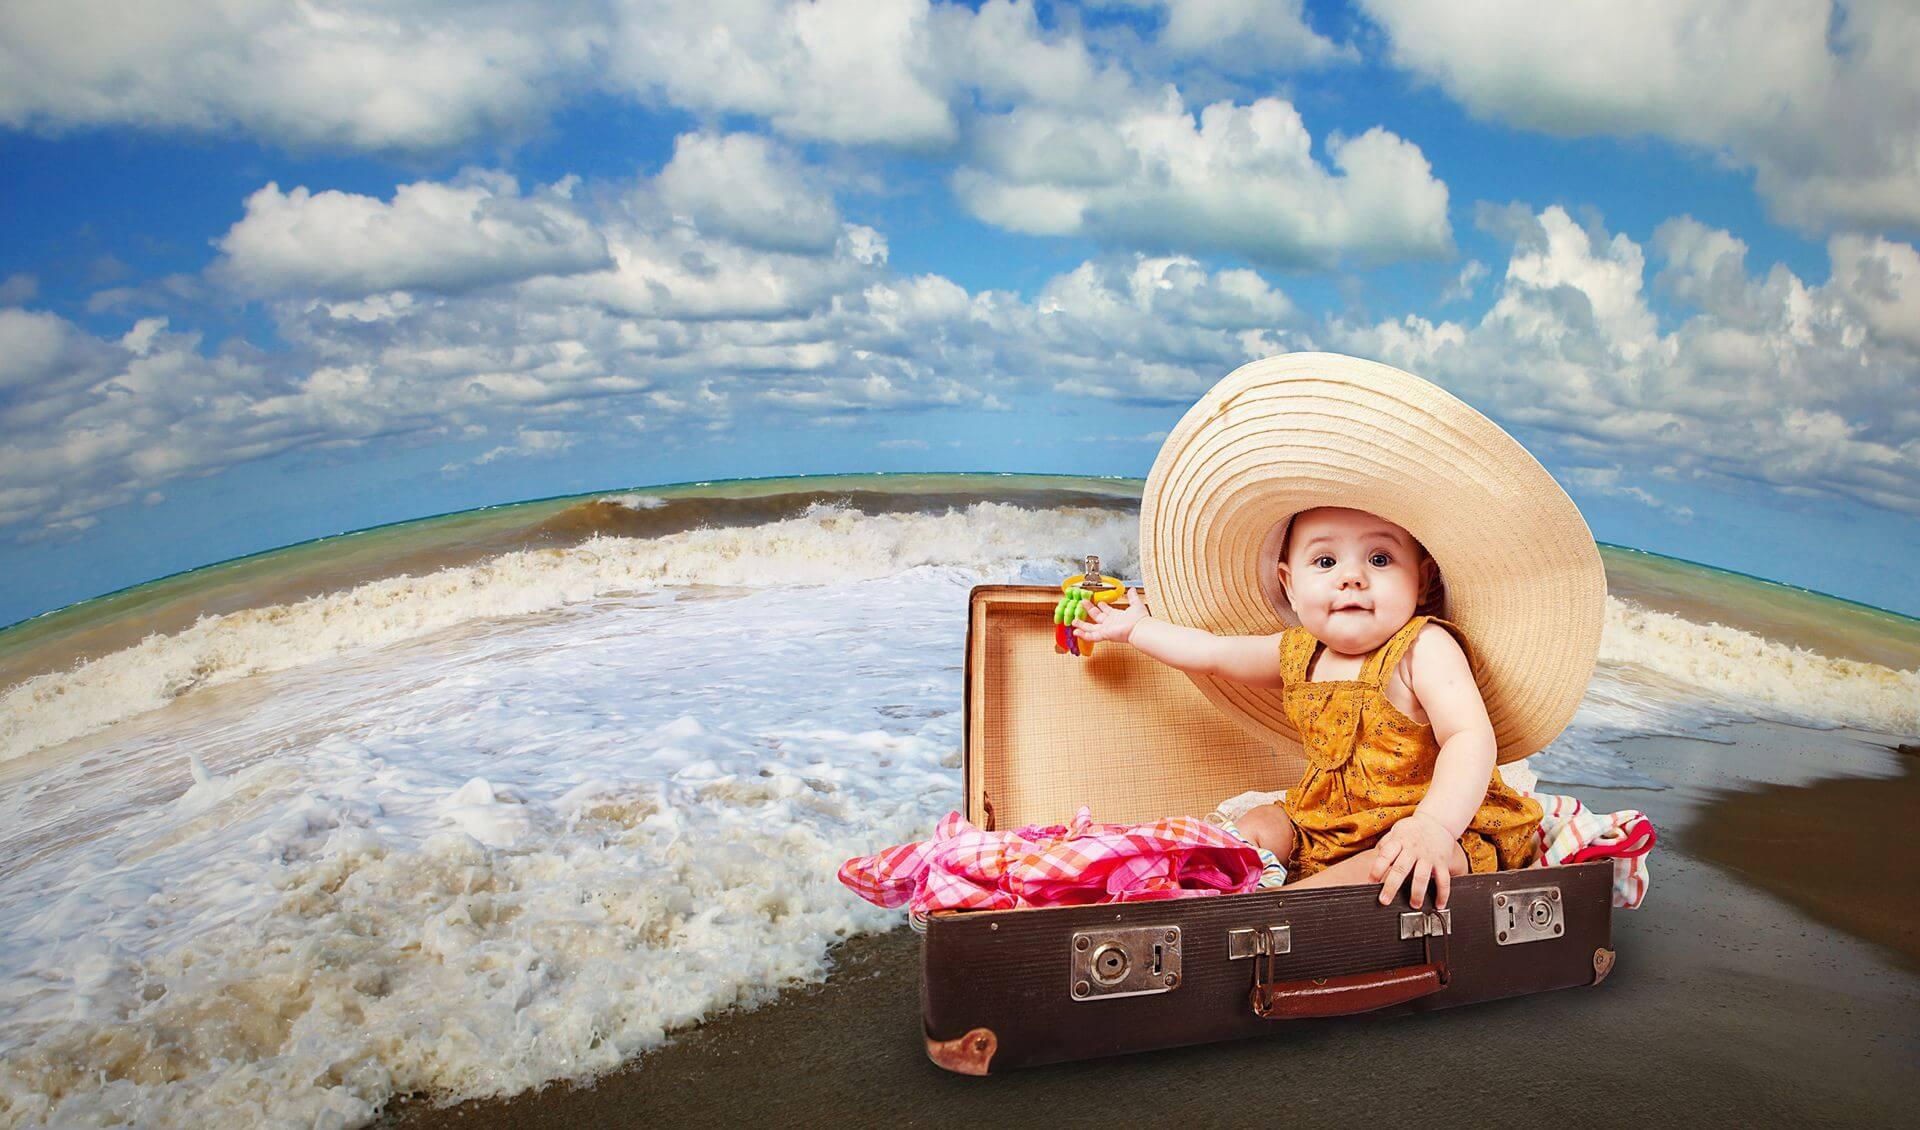 зачастую картинка с чемоданами на море желаю тебе нести